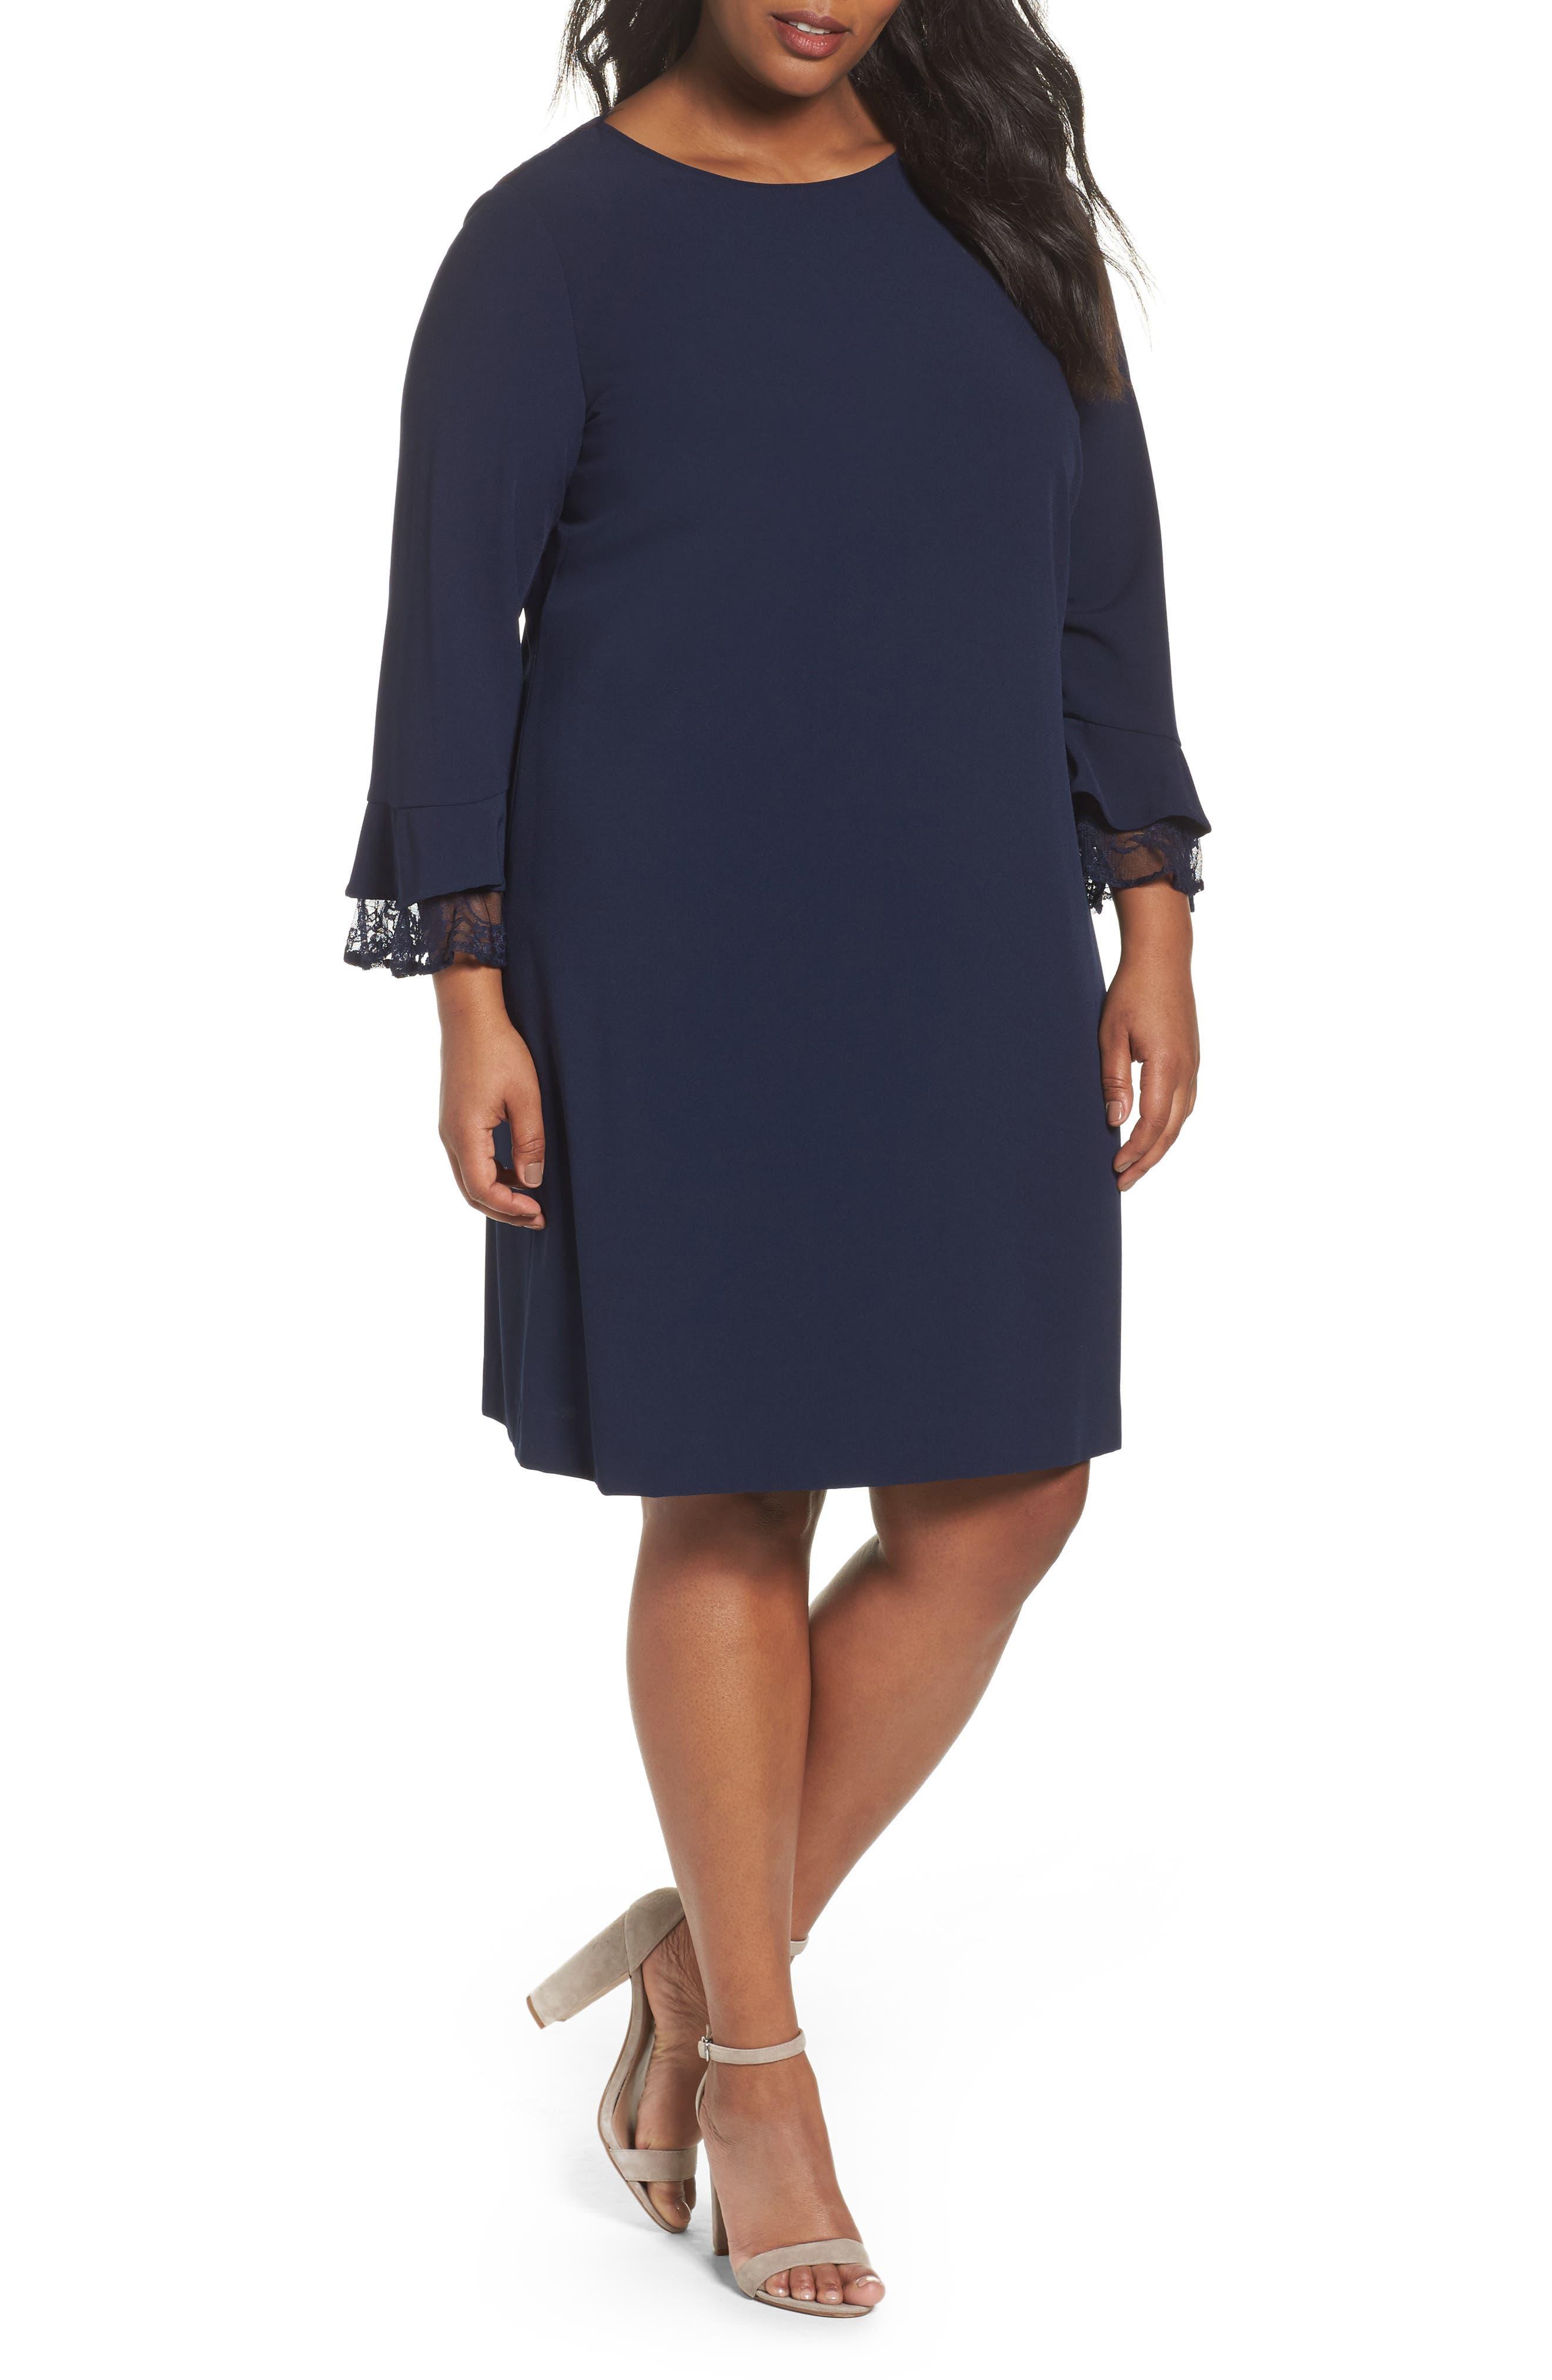 Main Image - Tahari Lace Trim Shift Dress (Plus Size)